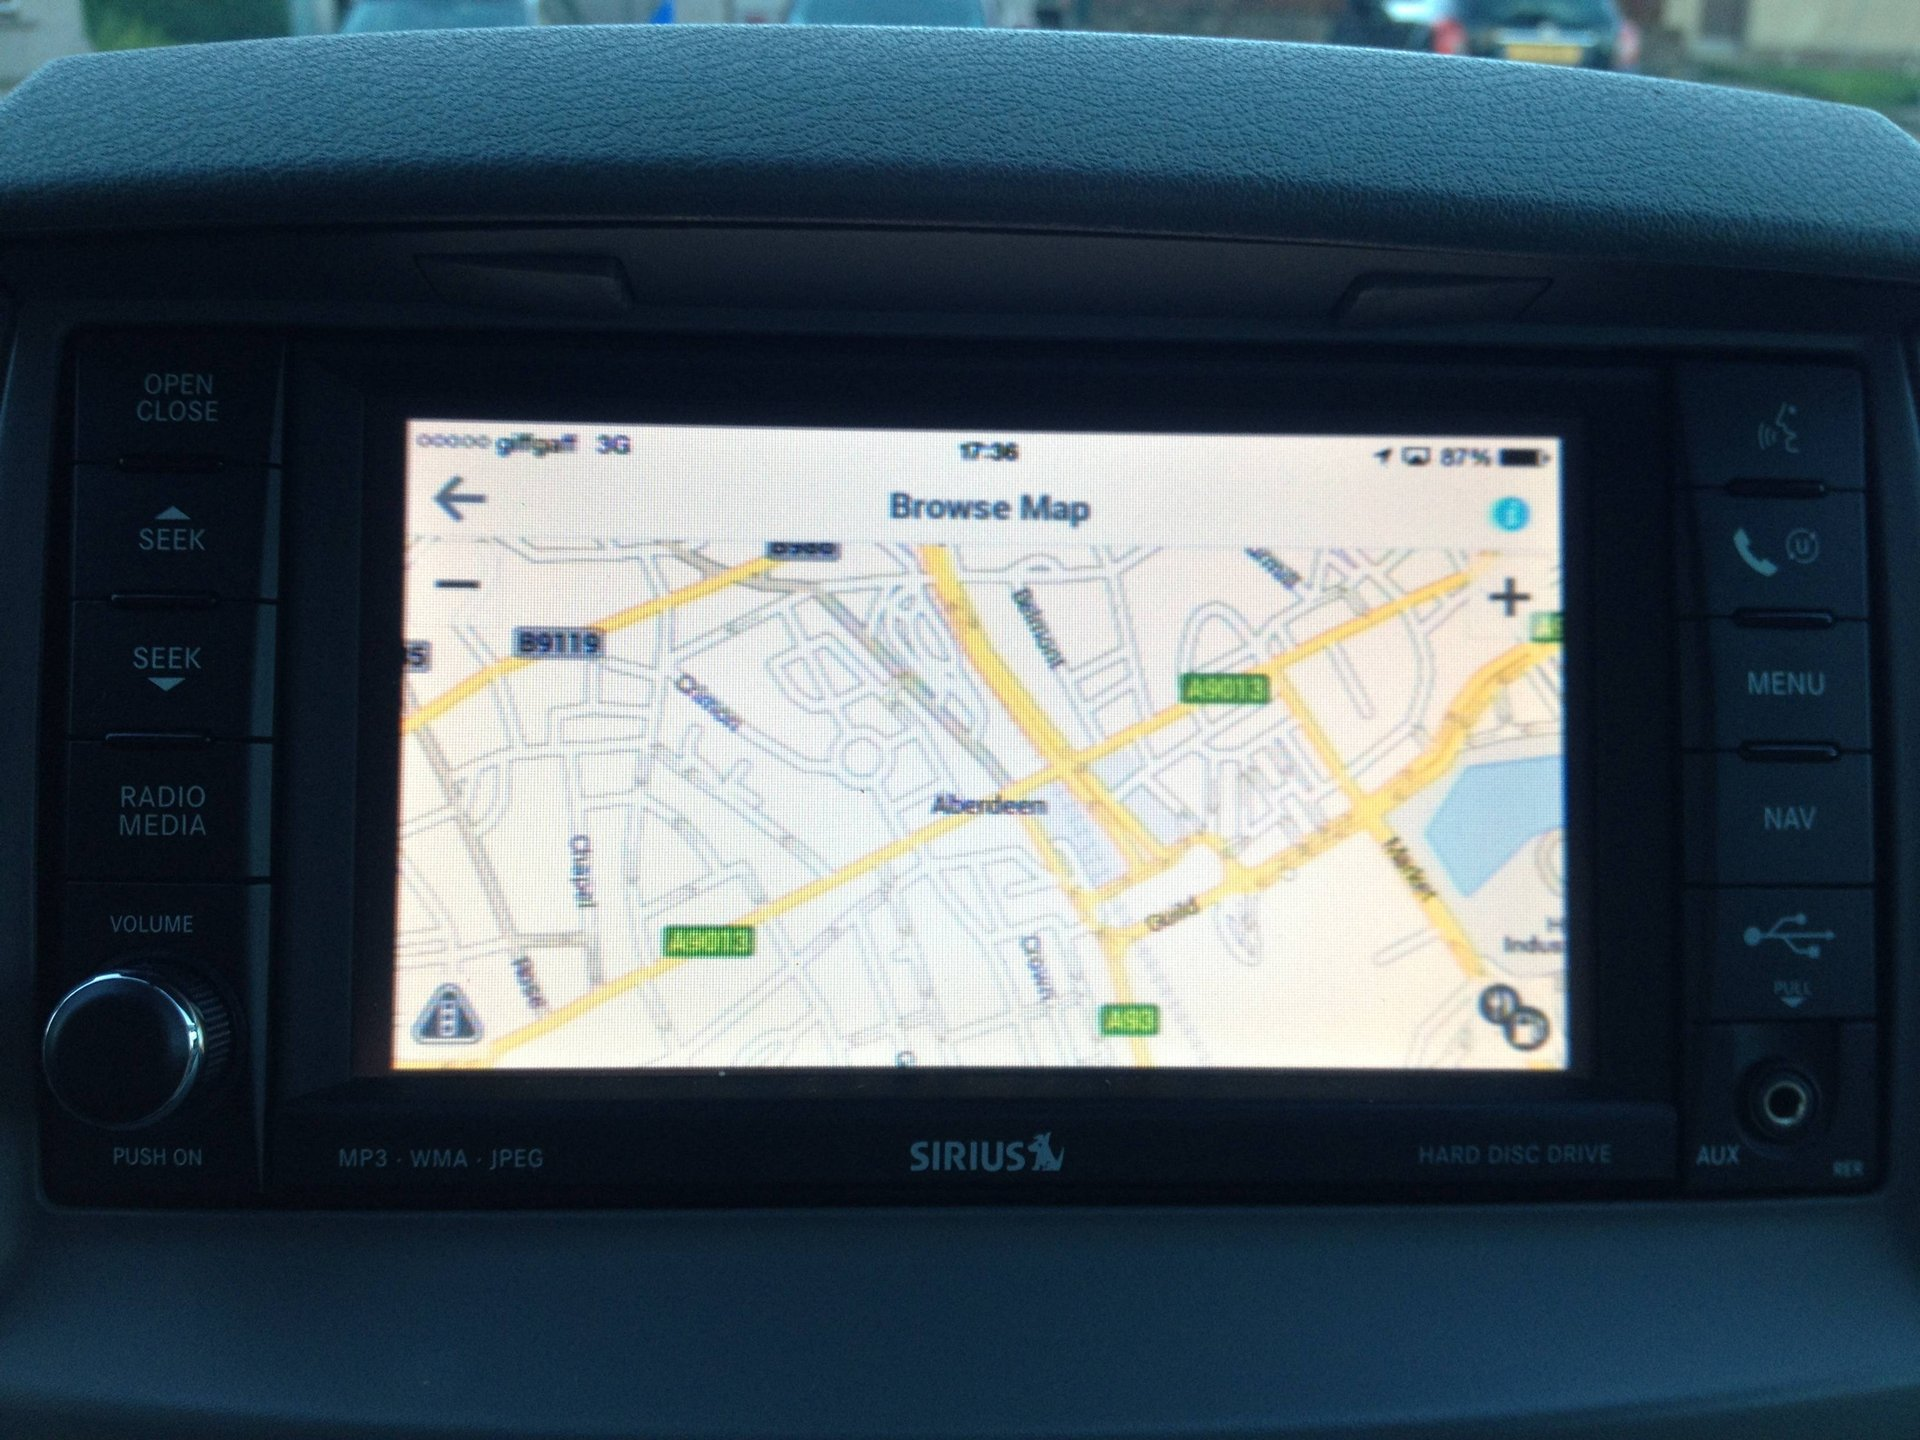 Lockpick + RER vs iPhone 4S/5 | The Chrysler Minivan Fan Club Forums